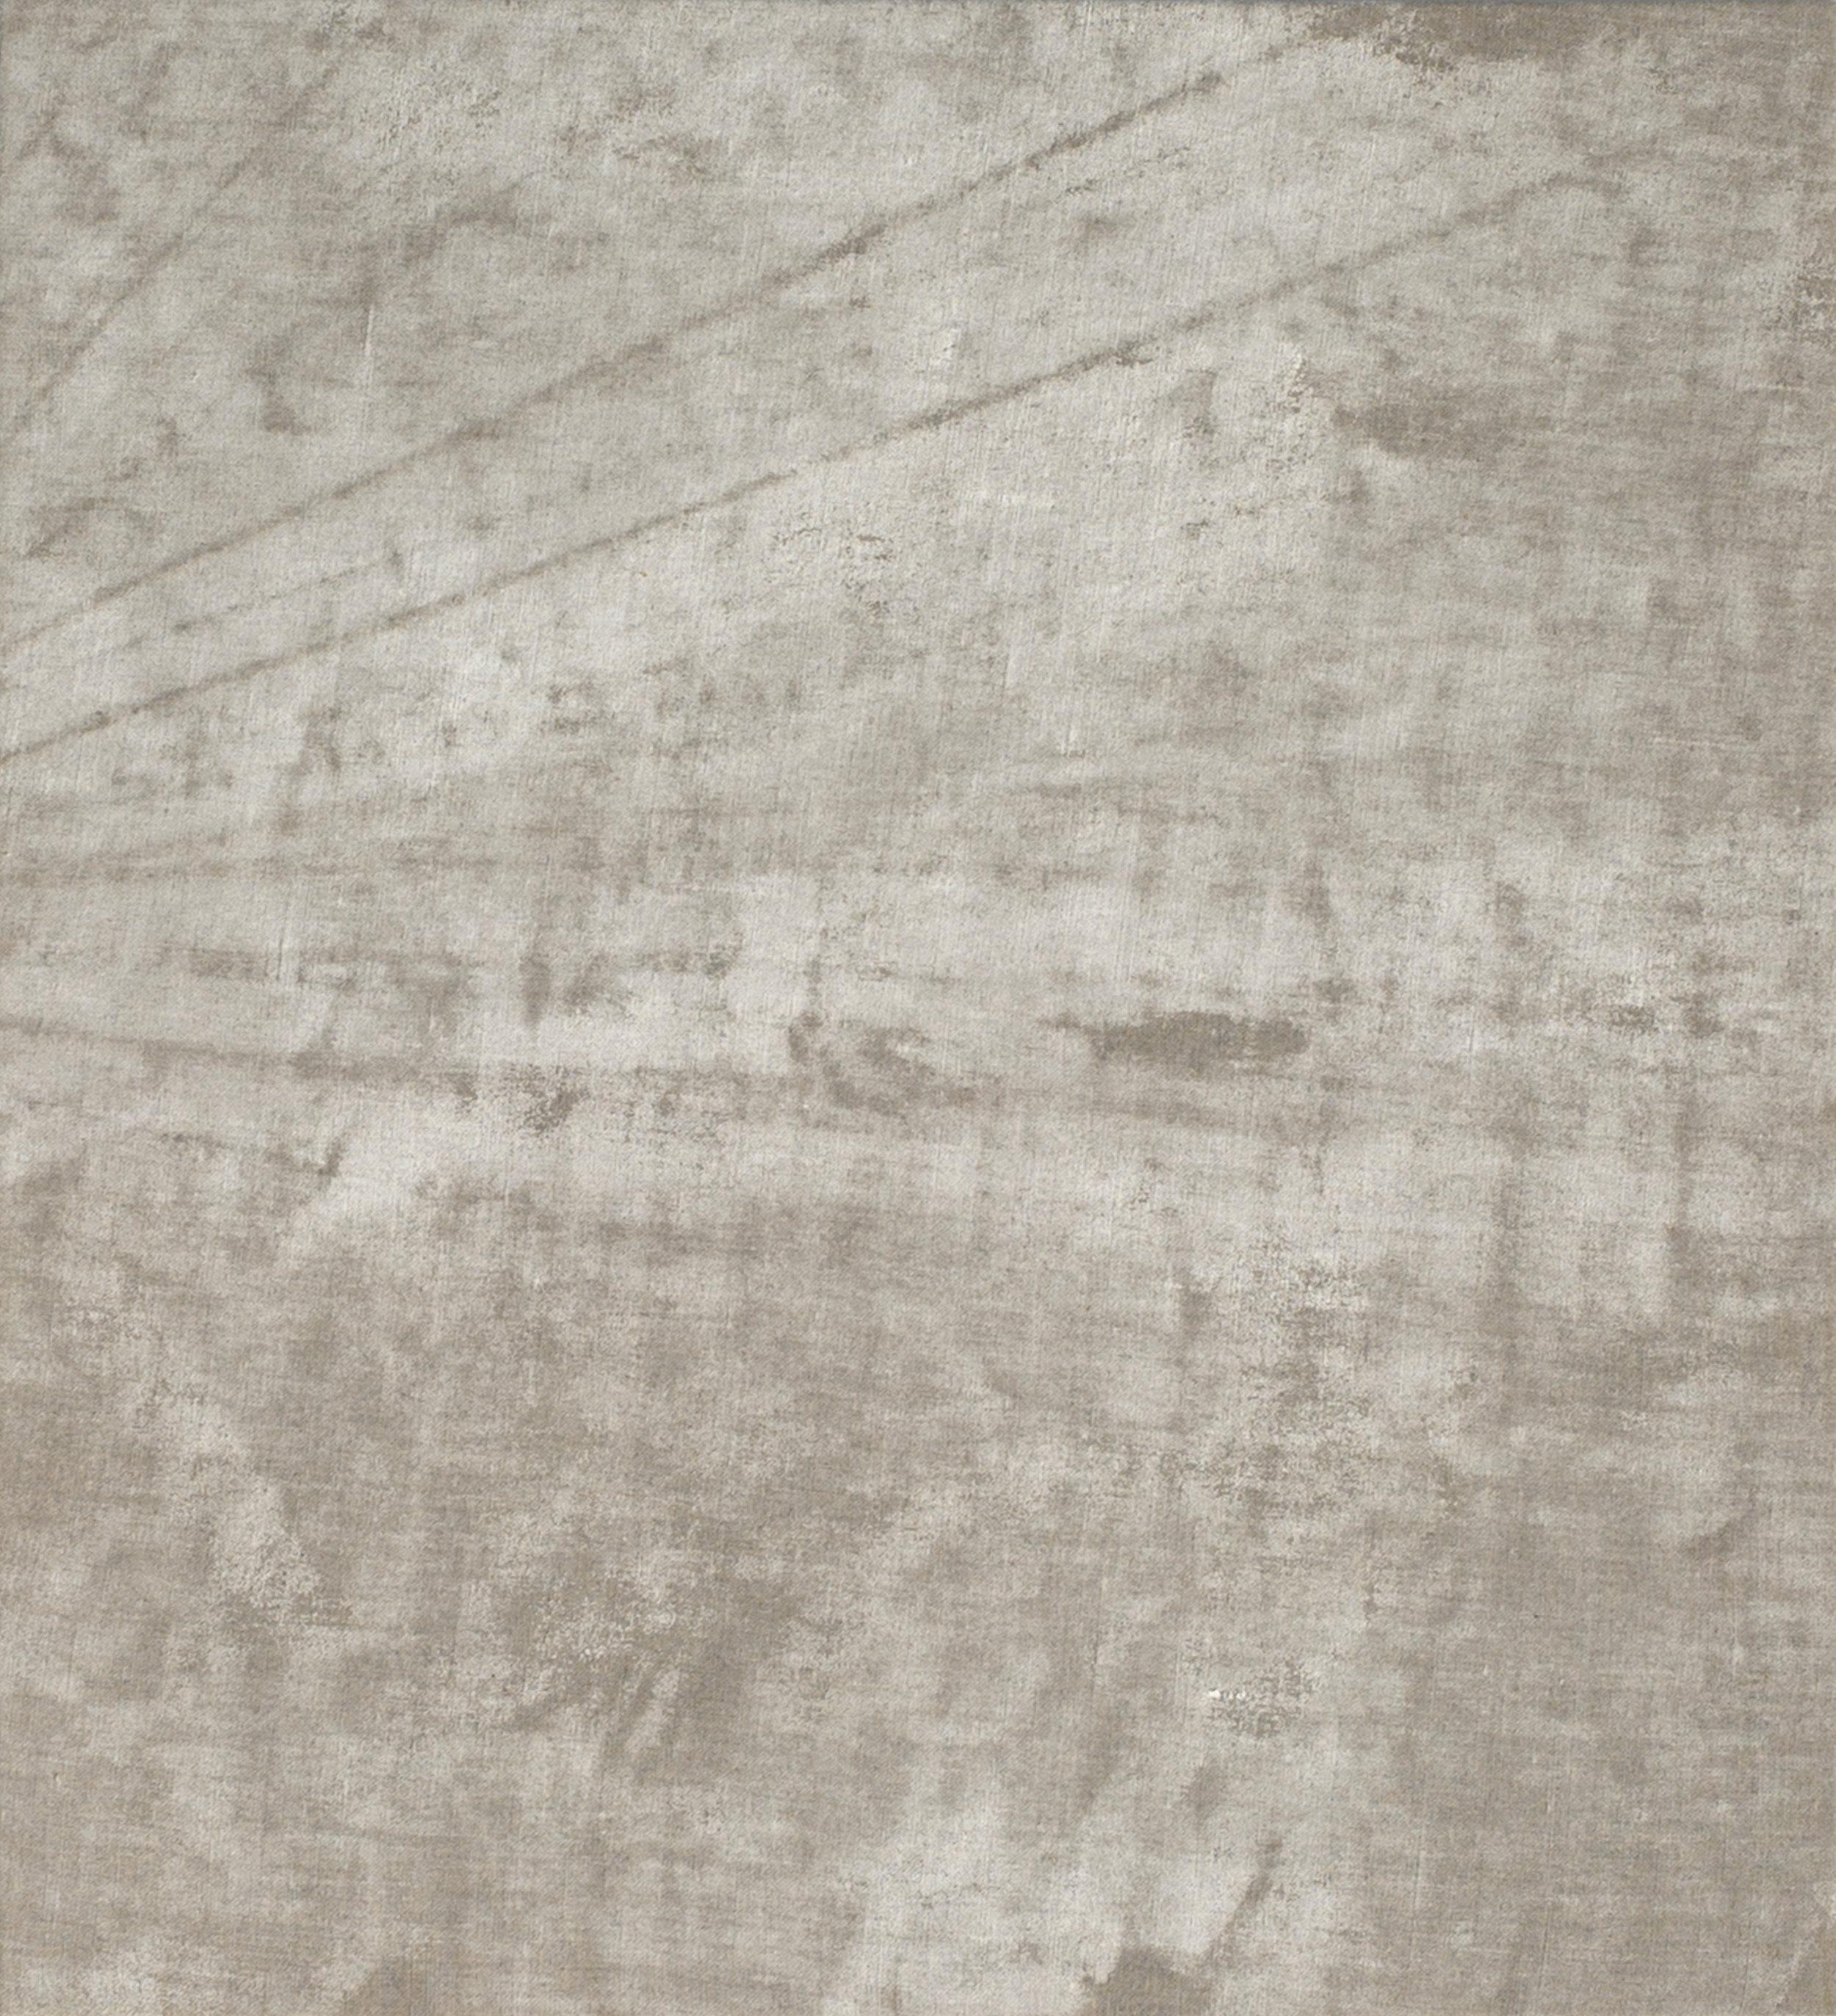 "sandbars under situational restraints  2018 mixed media on linen 22 x 20""   INQUIRE"